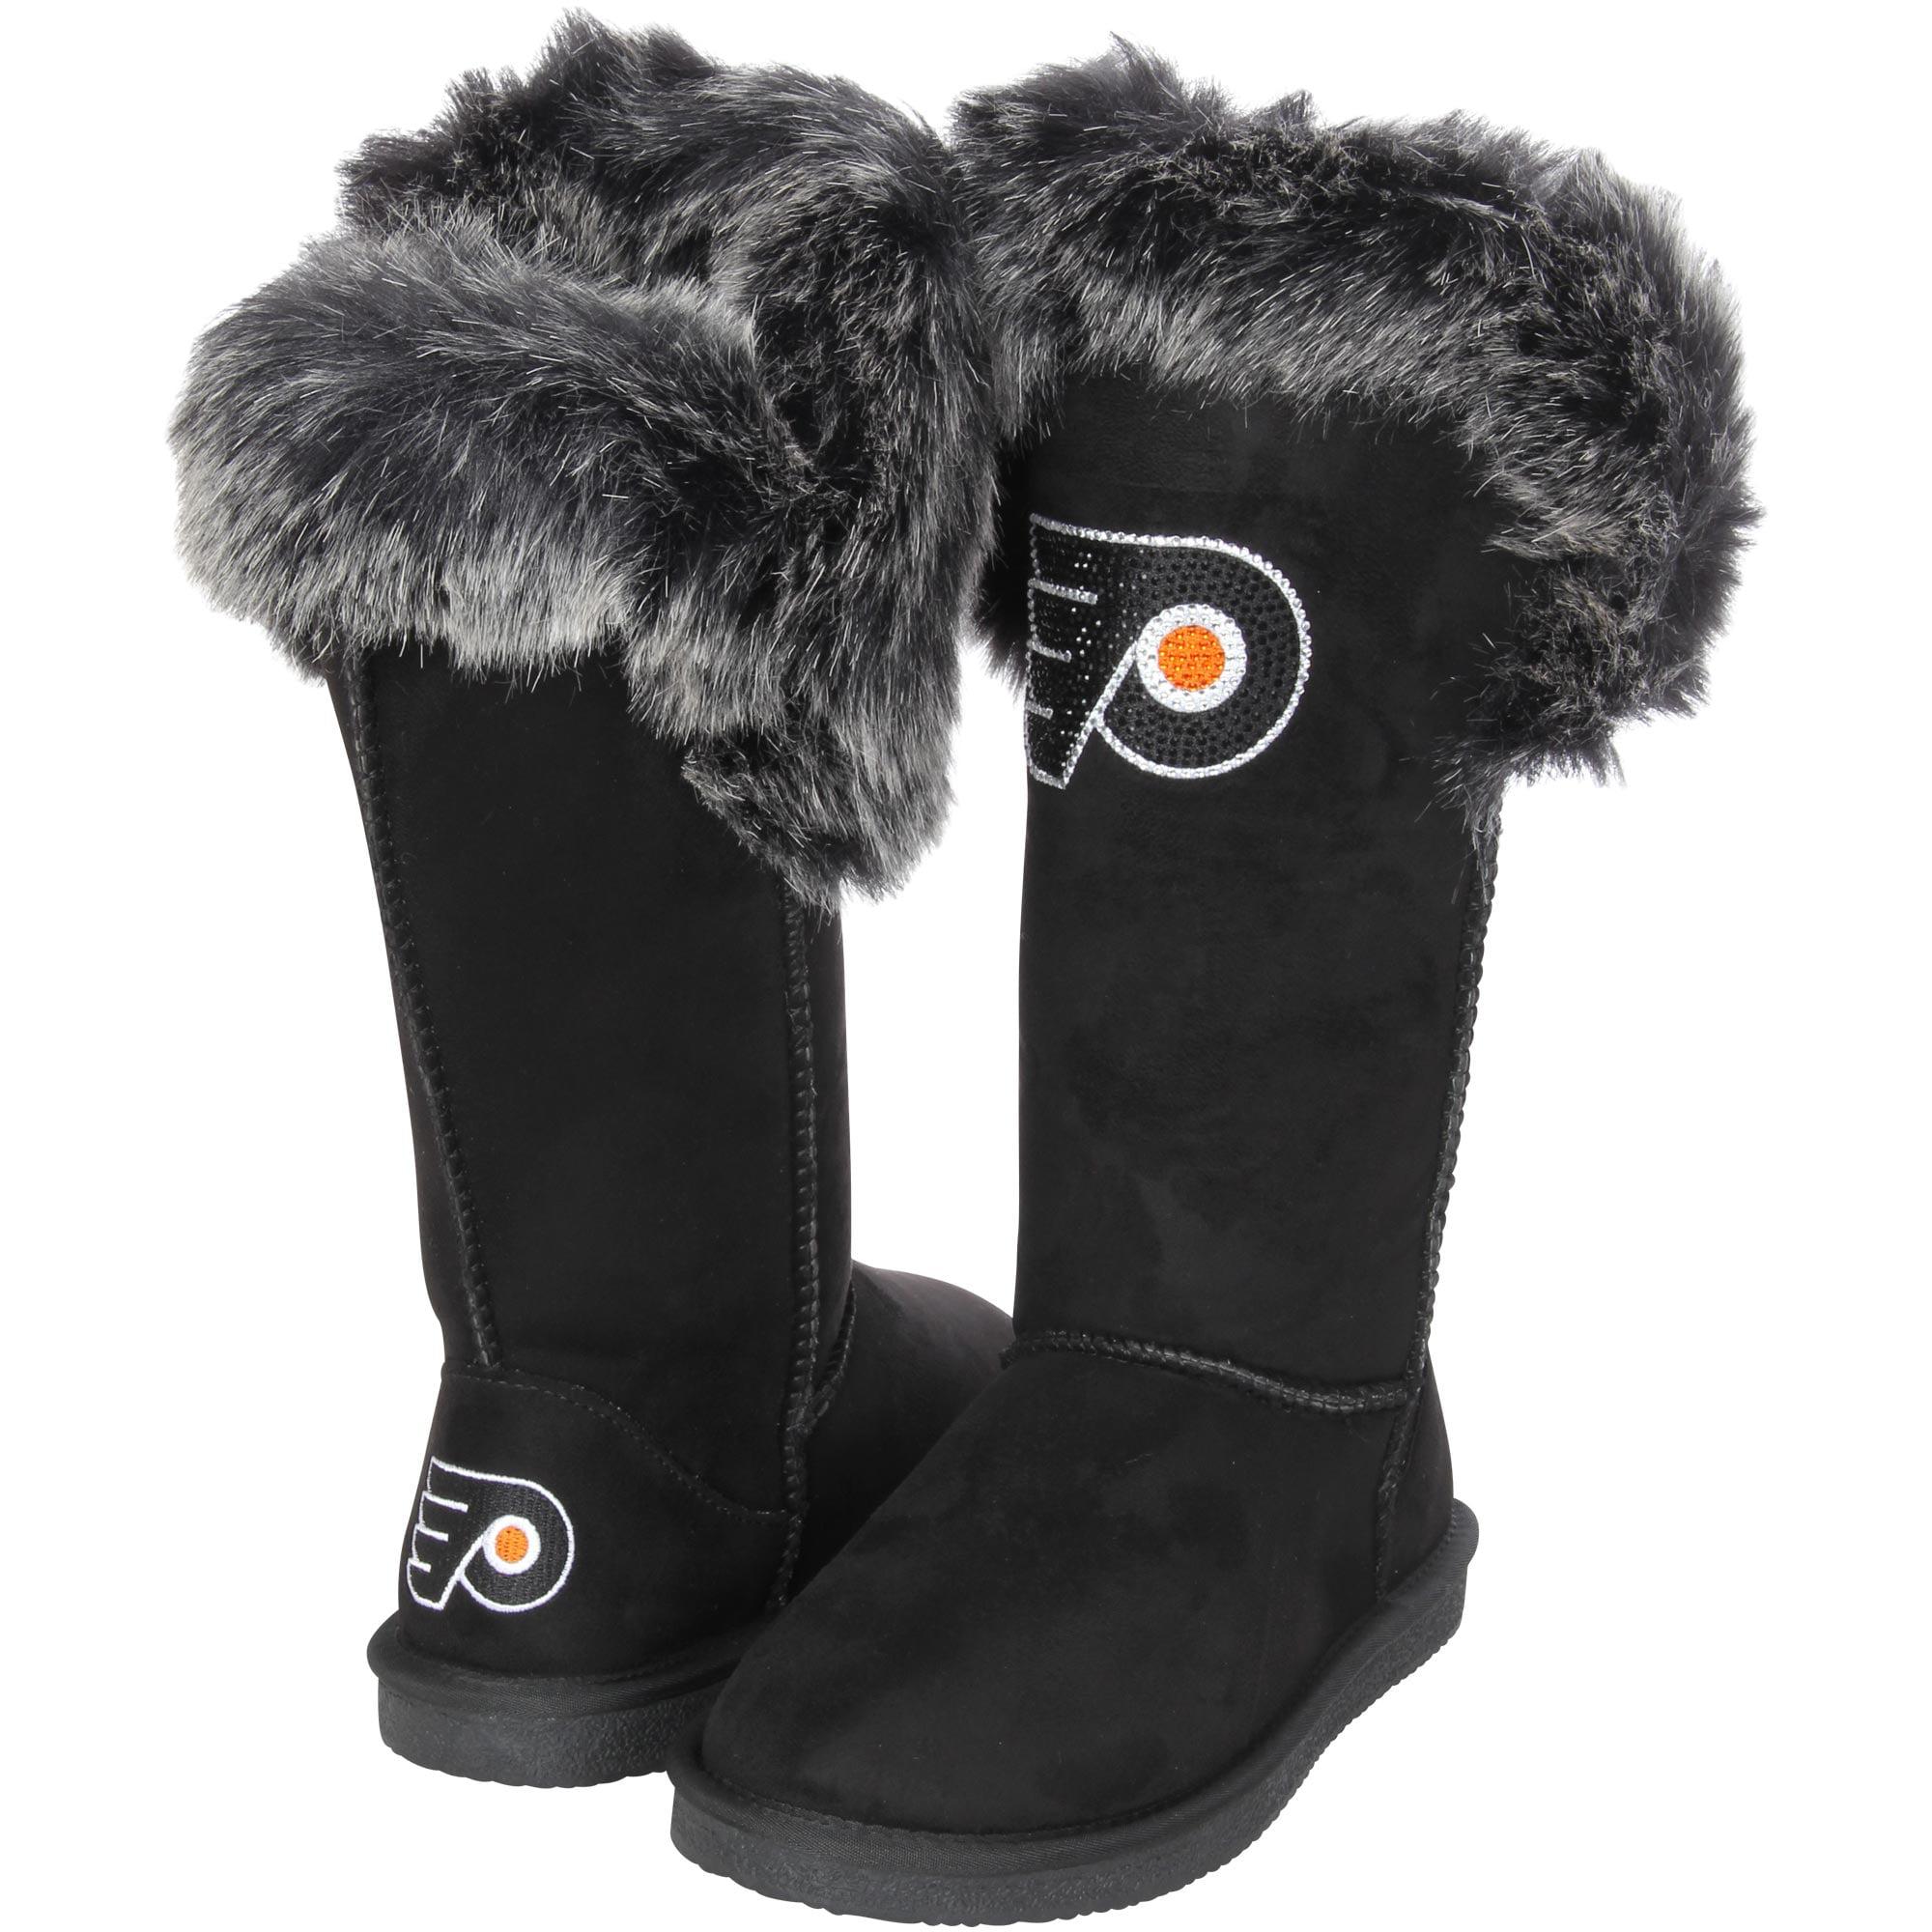 Women's Cuce Black Philadelphia Flyers Devoted Boots by Cuce Shoes